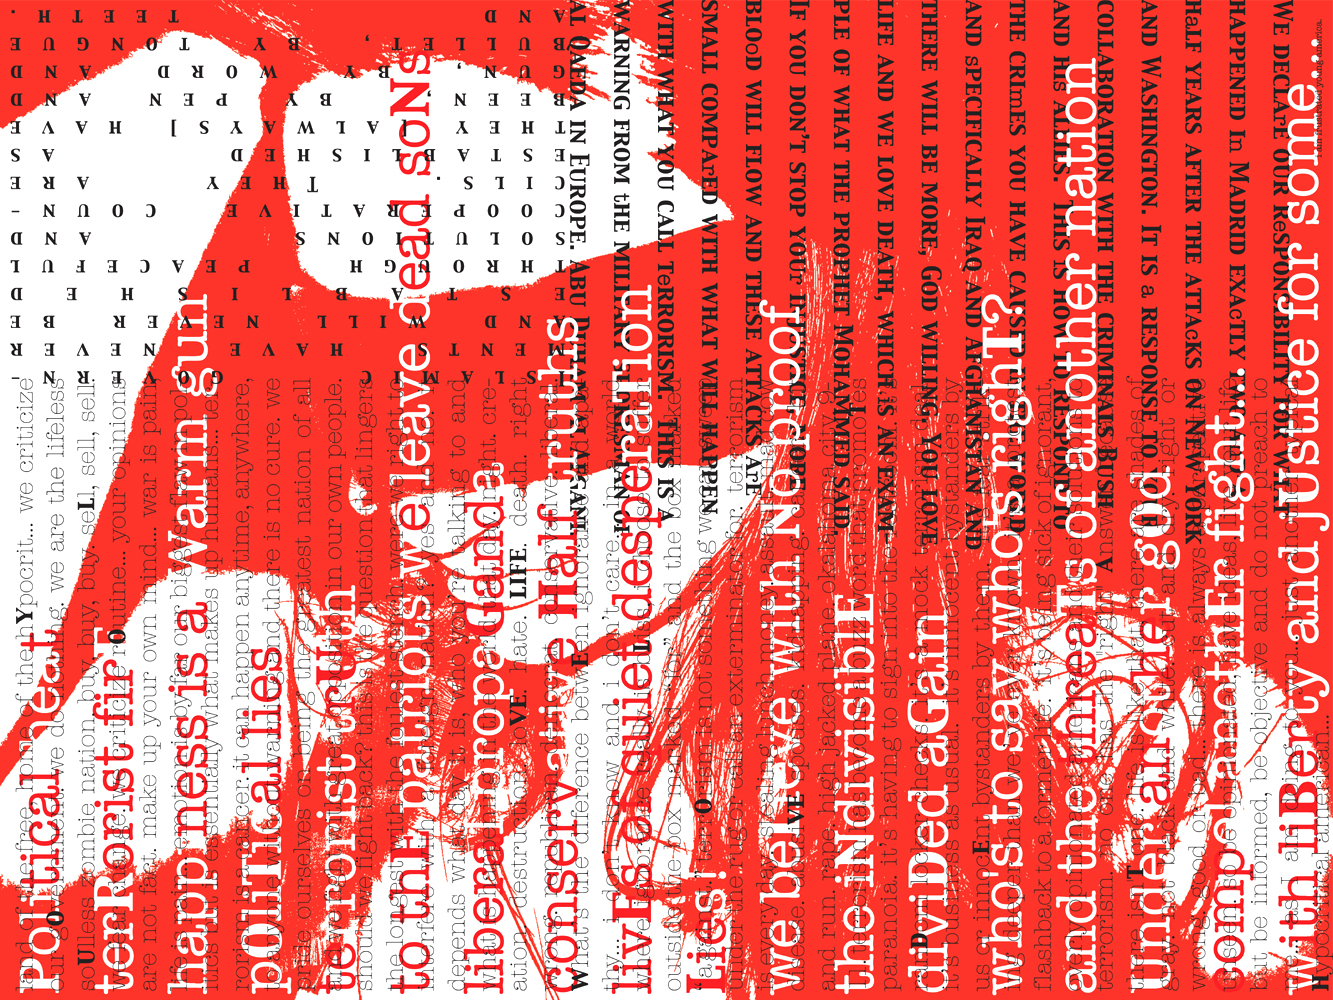 M - Terrorism Poster - 2004.jpg